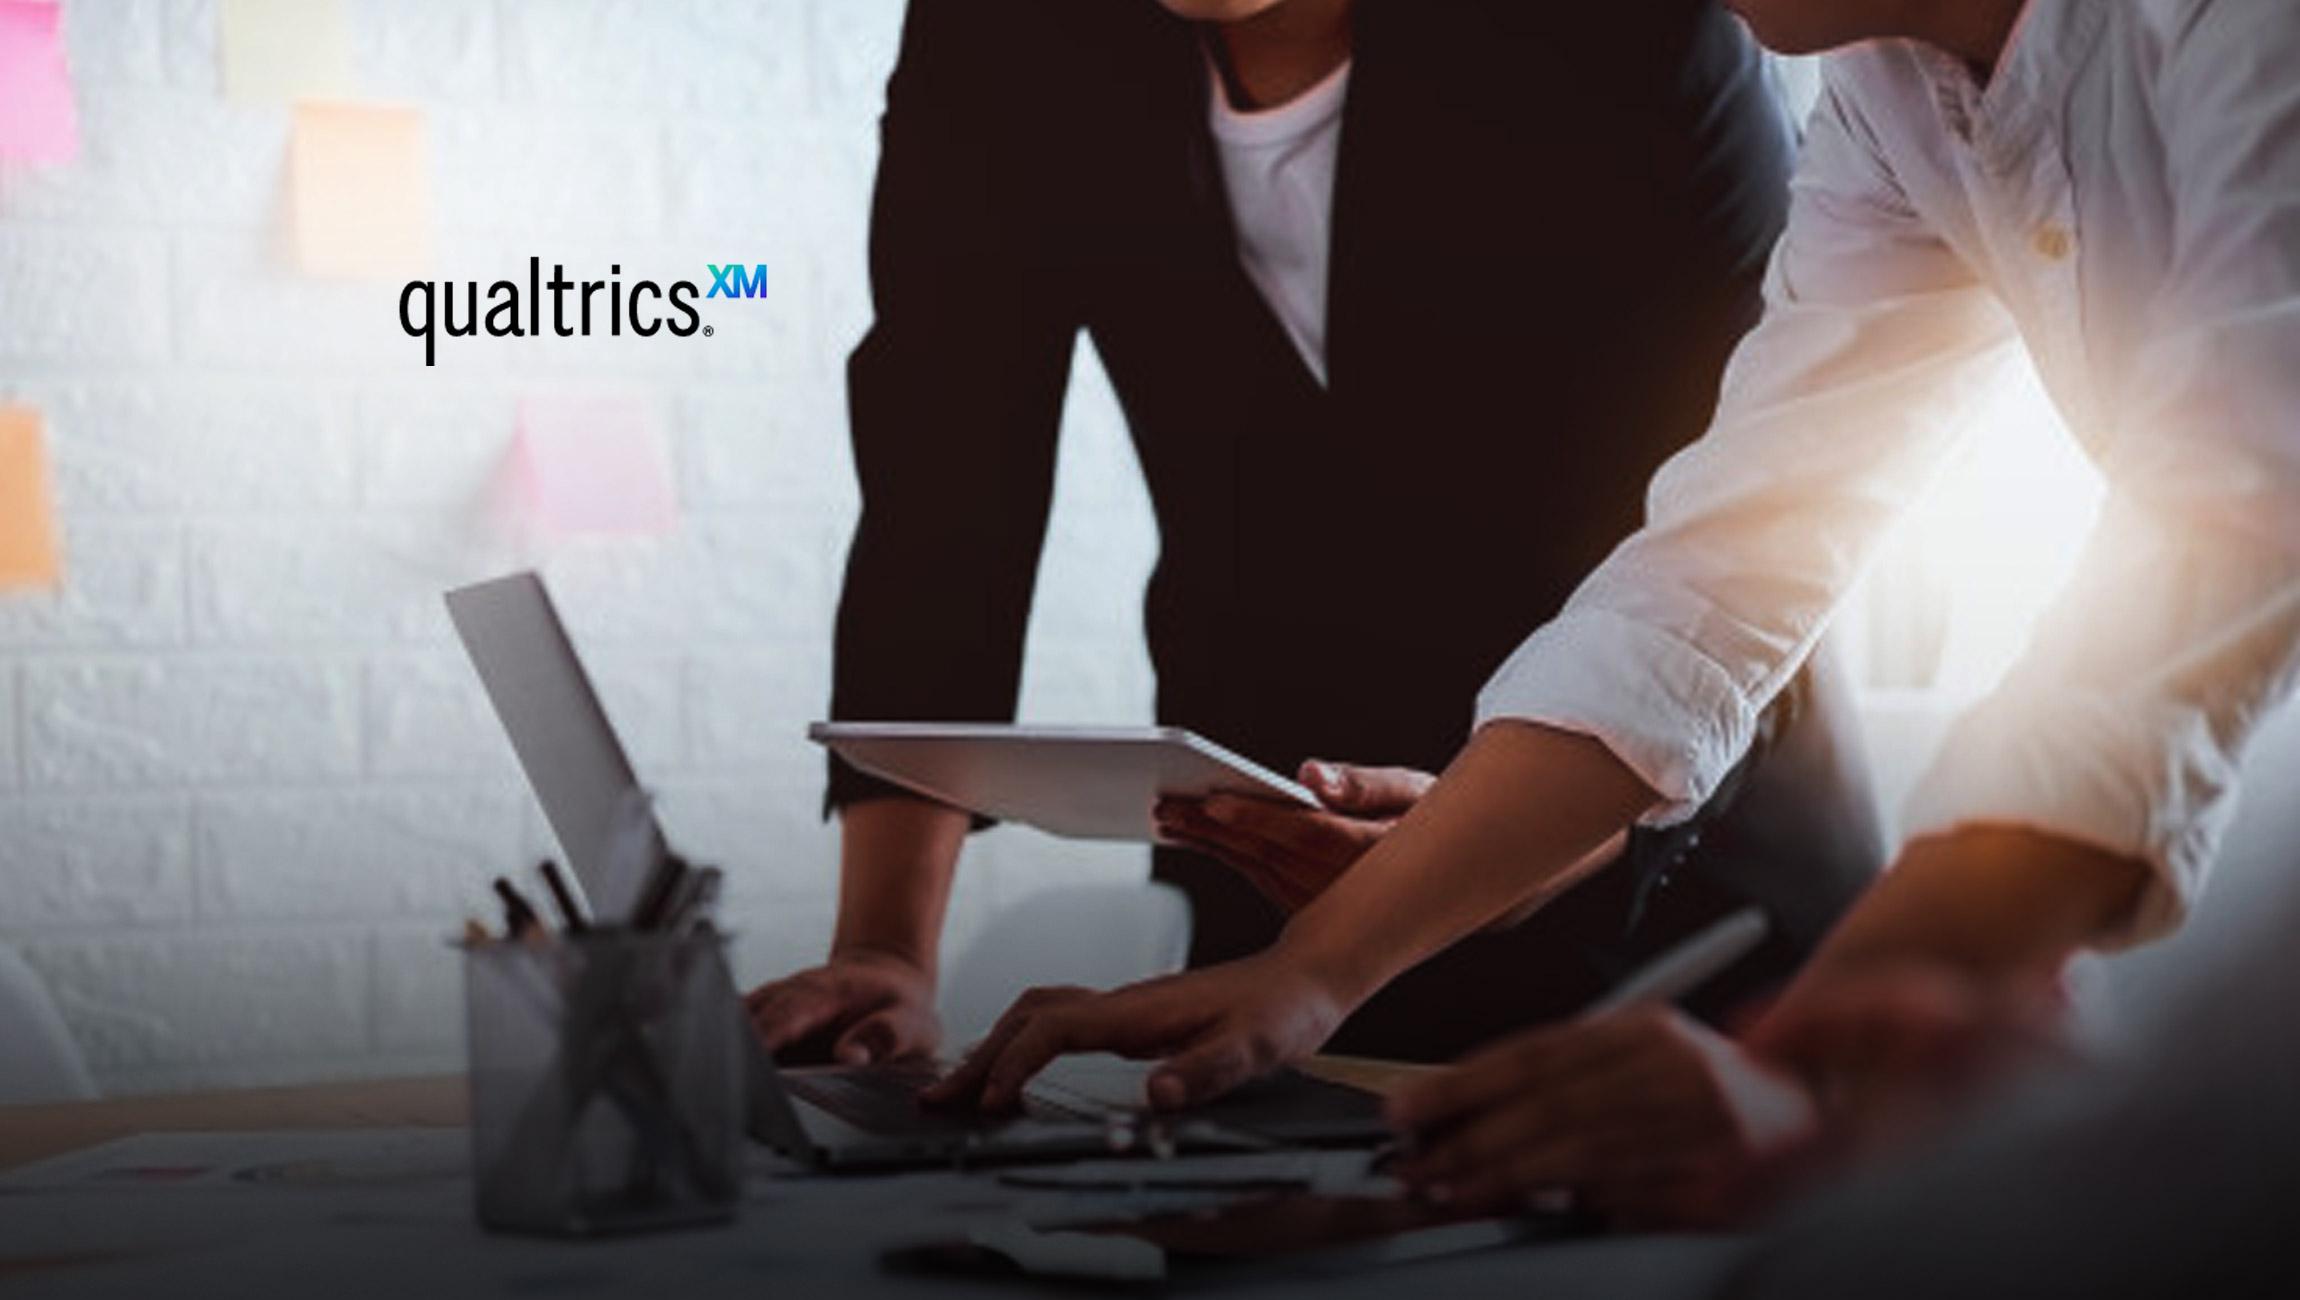 Qualtrics Announces New Program that Raises the Industry Standard for XM Certification